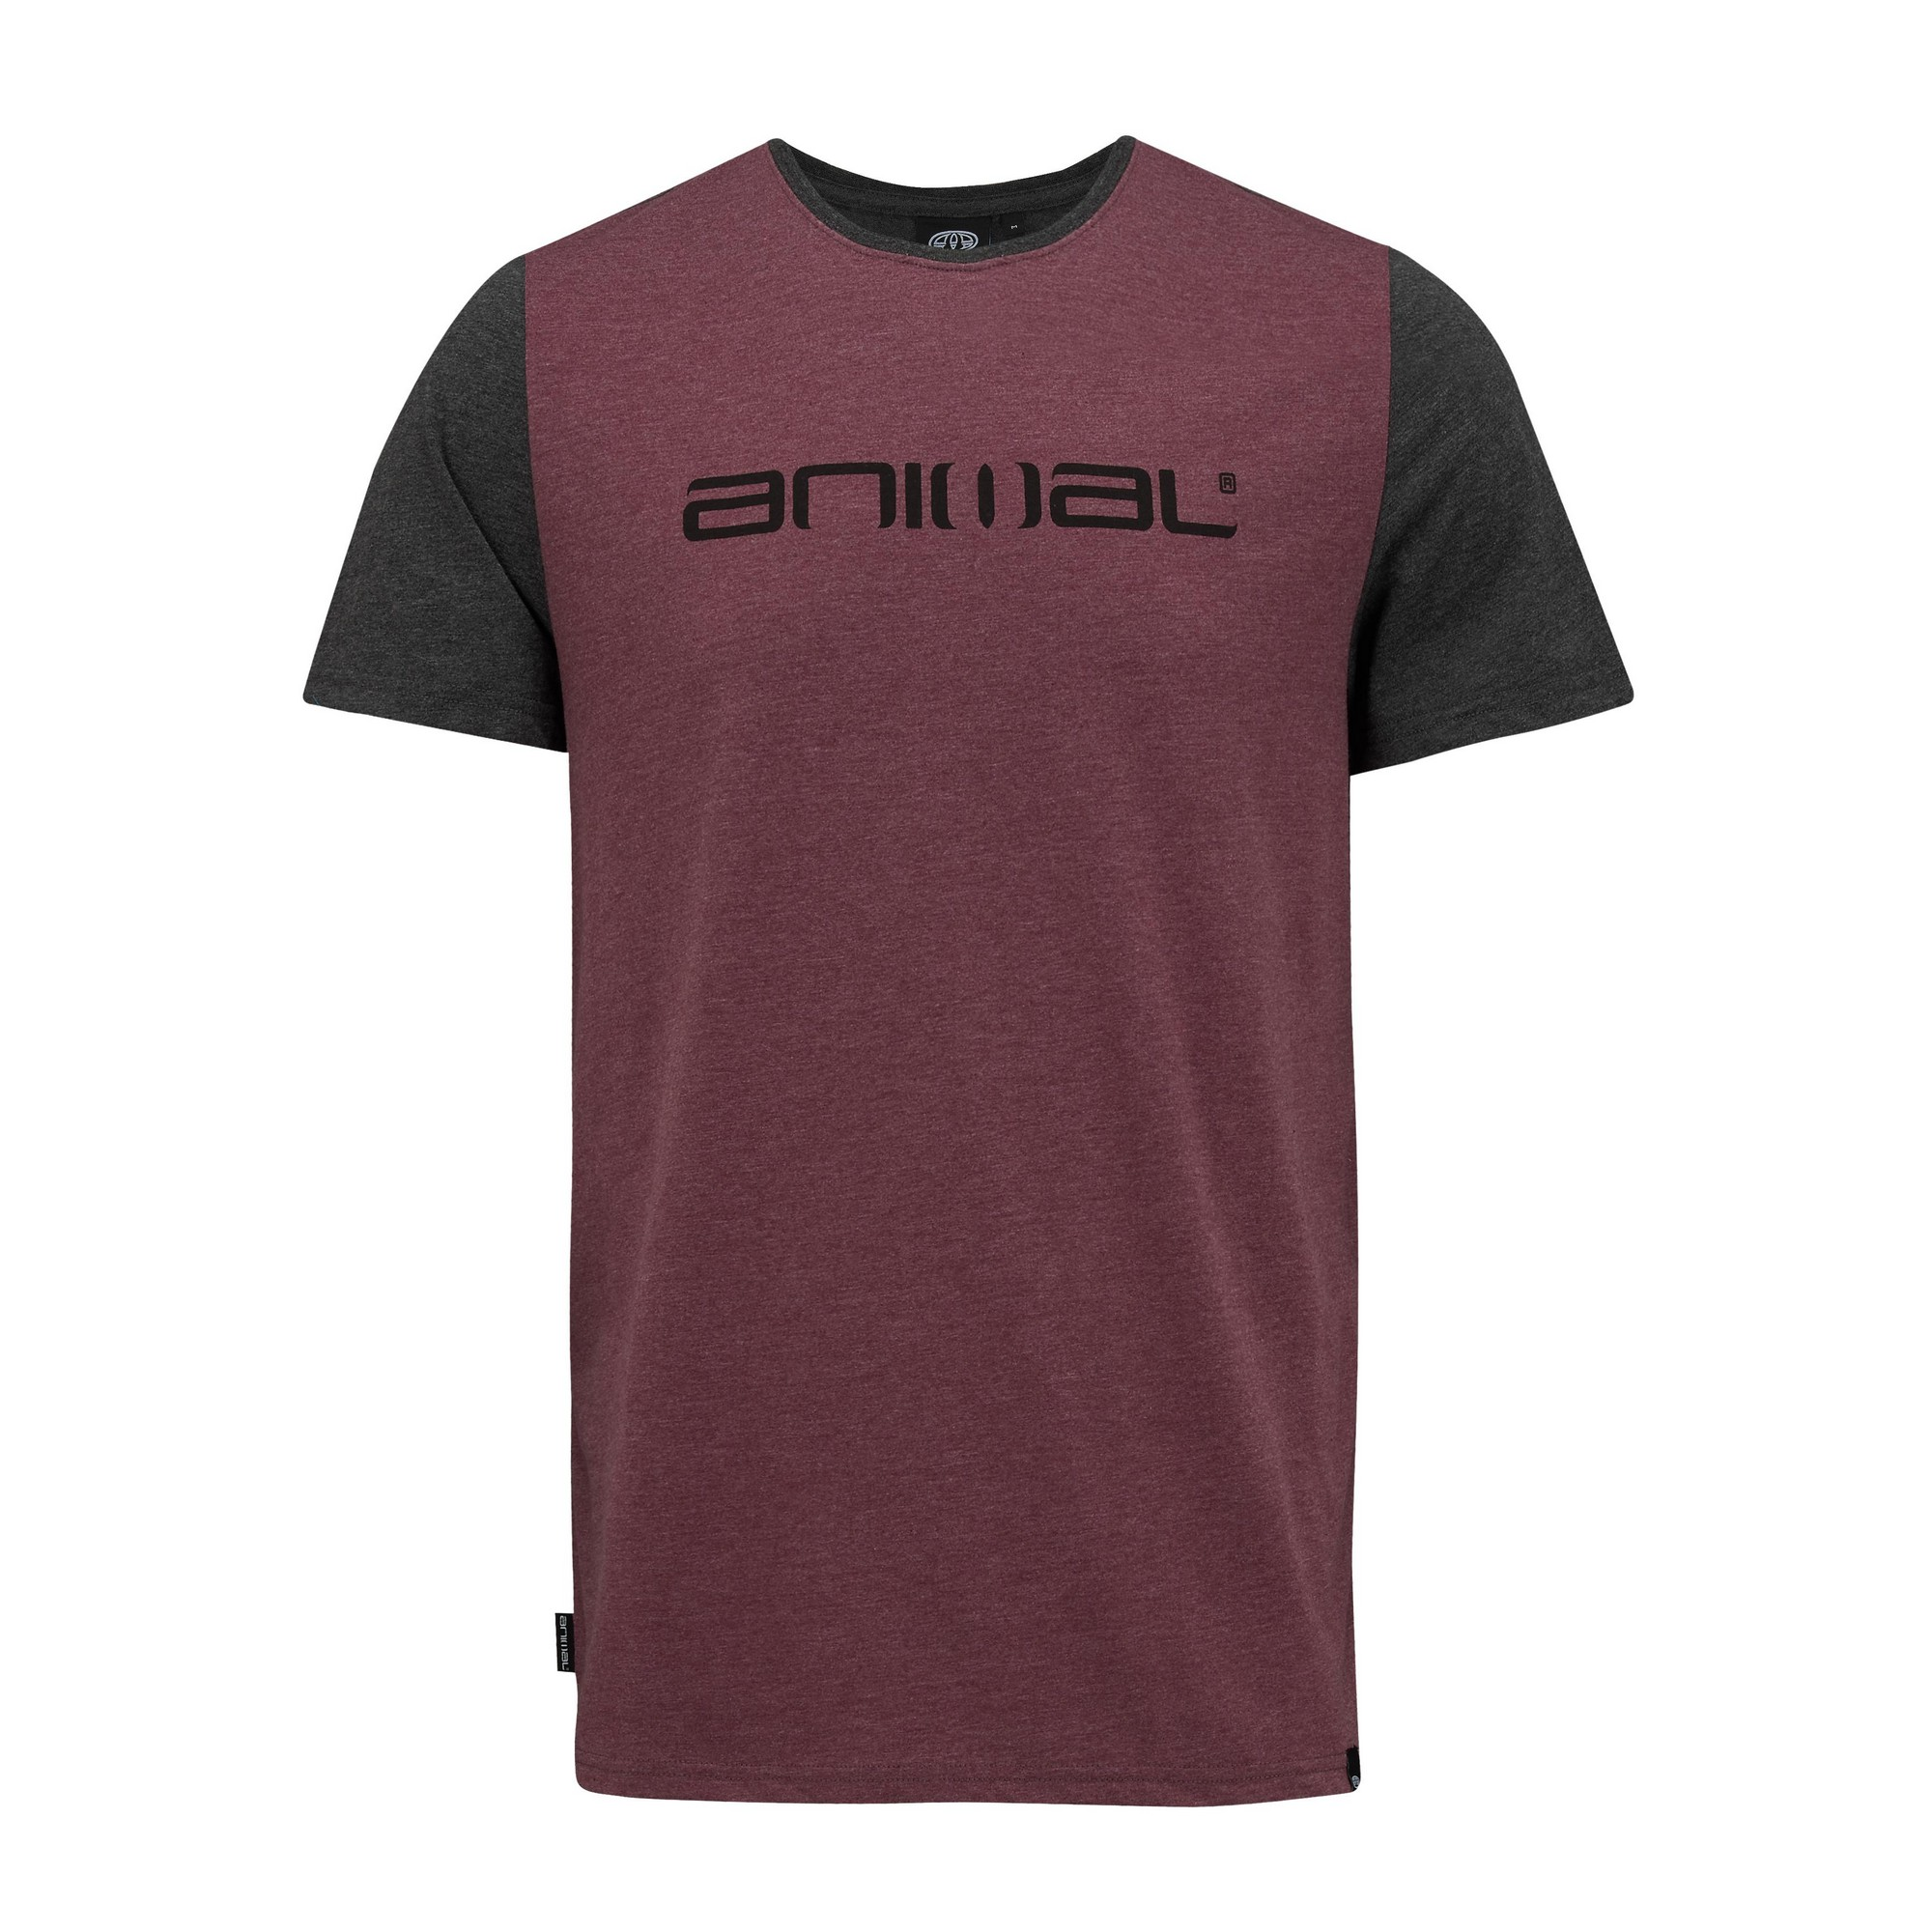 Animal-Camiseta-manga-corta-contraste-Modelo-Jeff-hombre-caballero